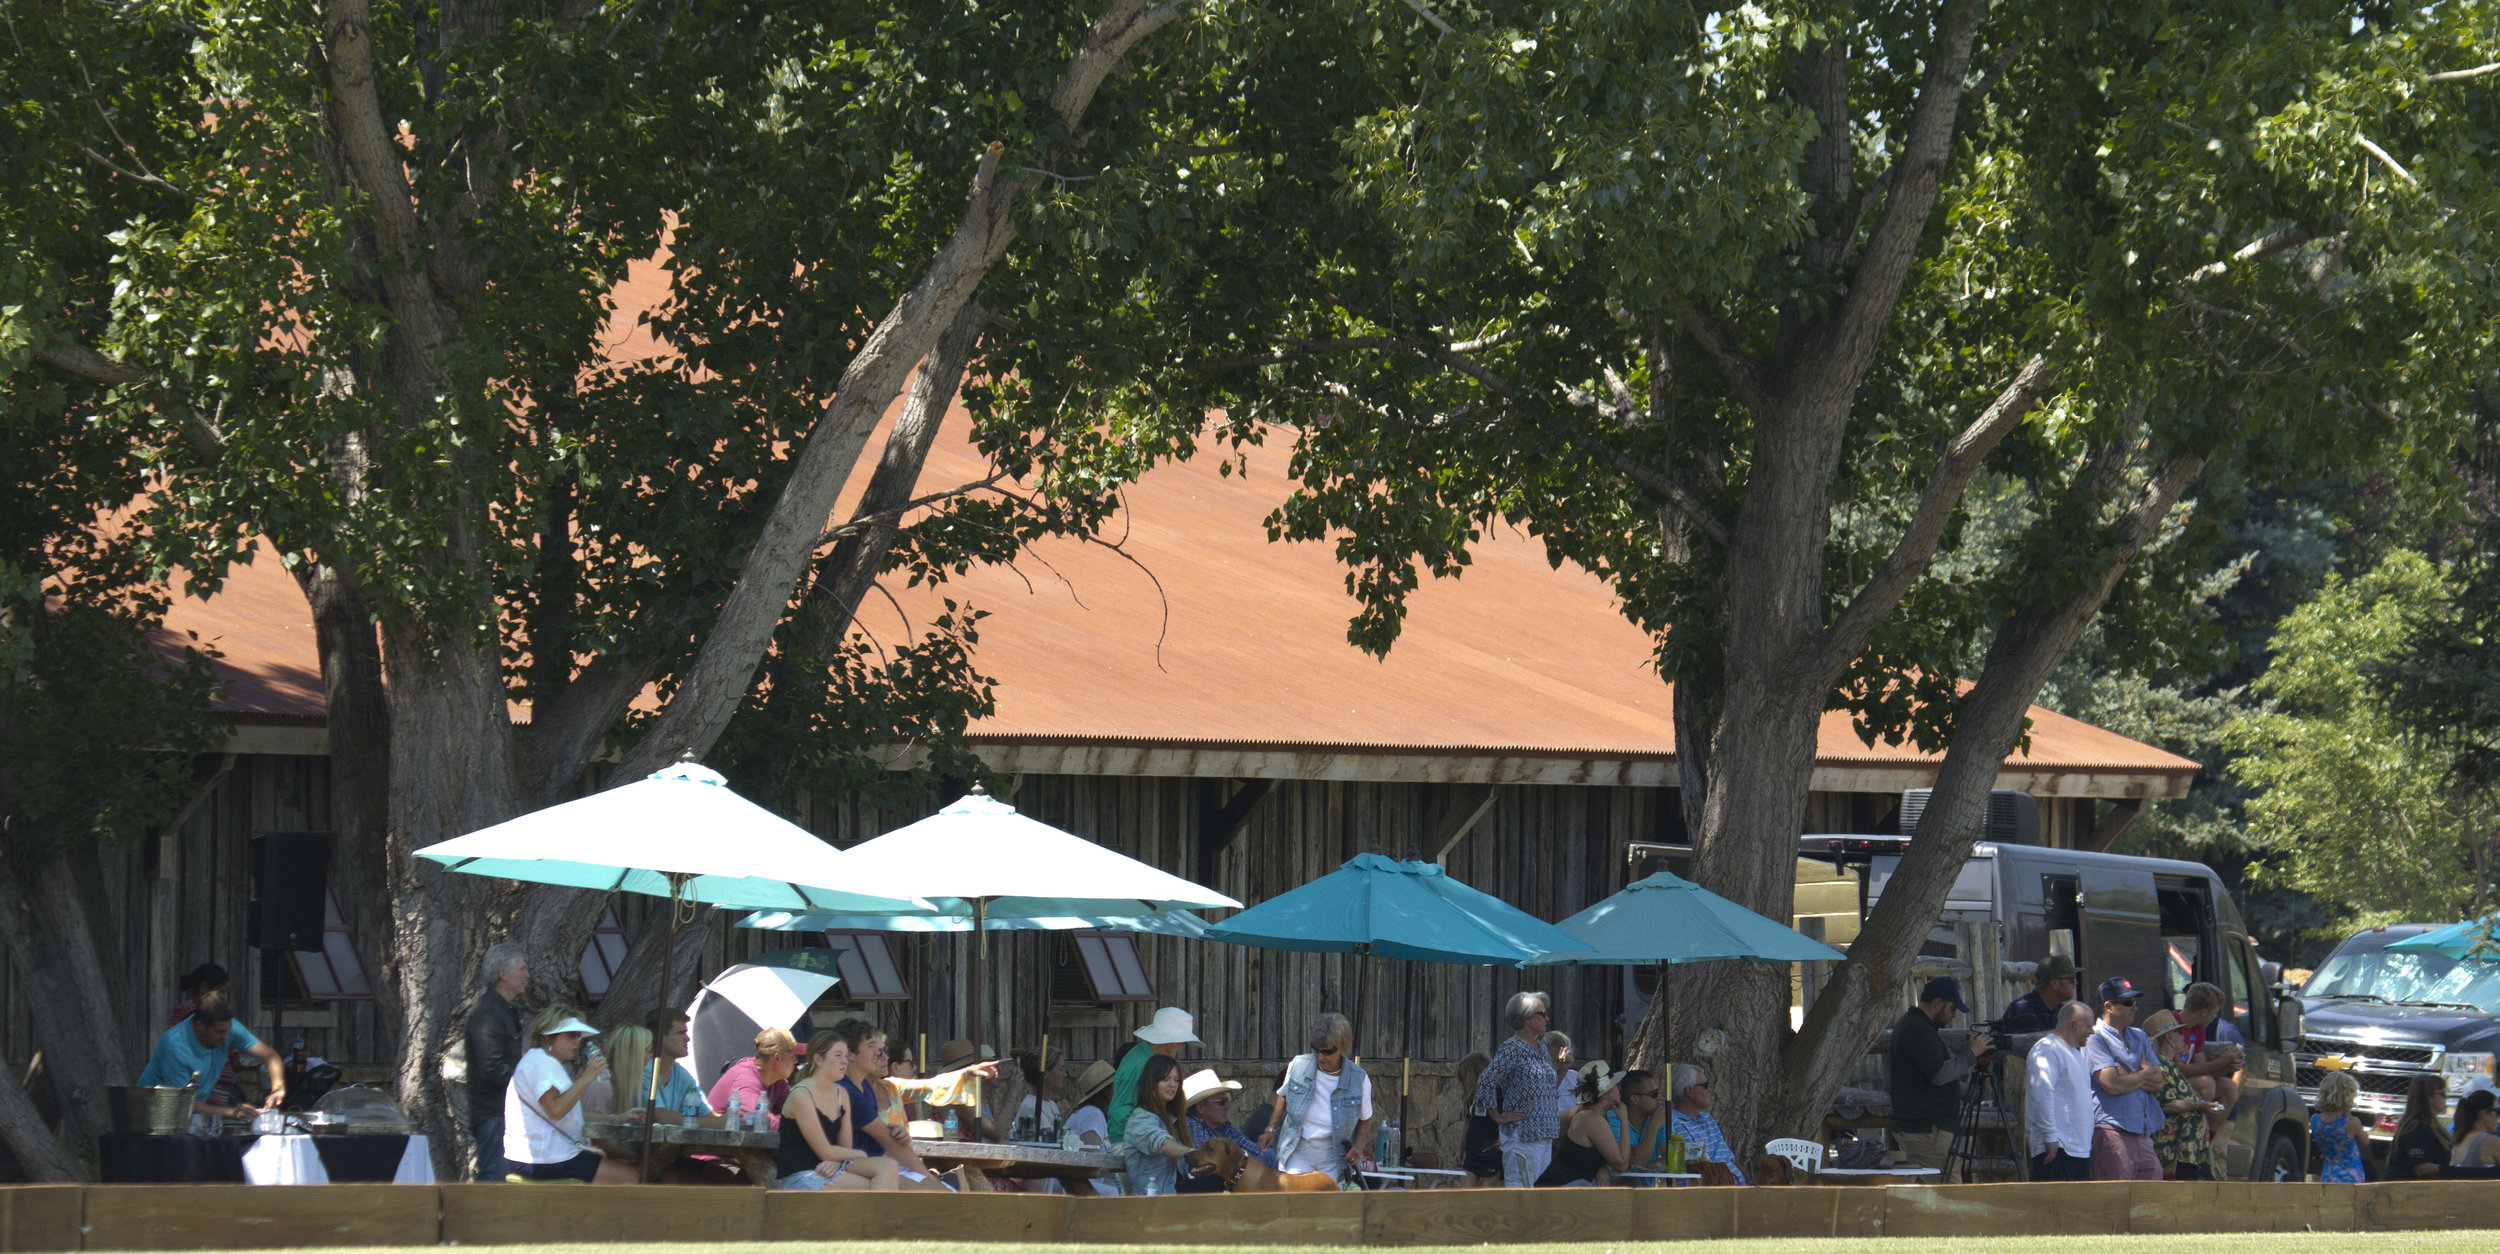 A good local crowd enjoying the polo at A.JPG